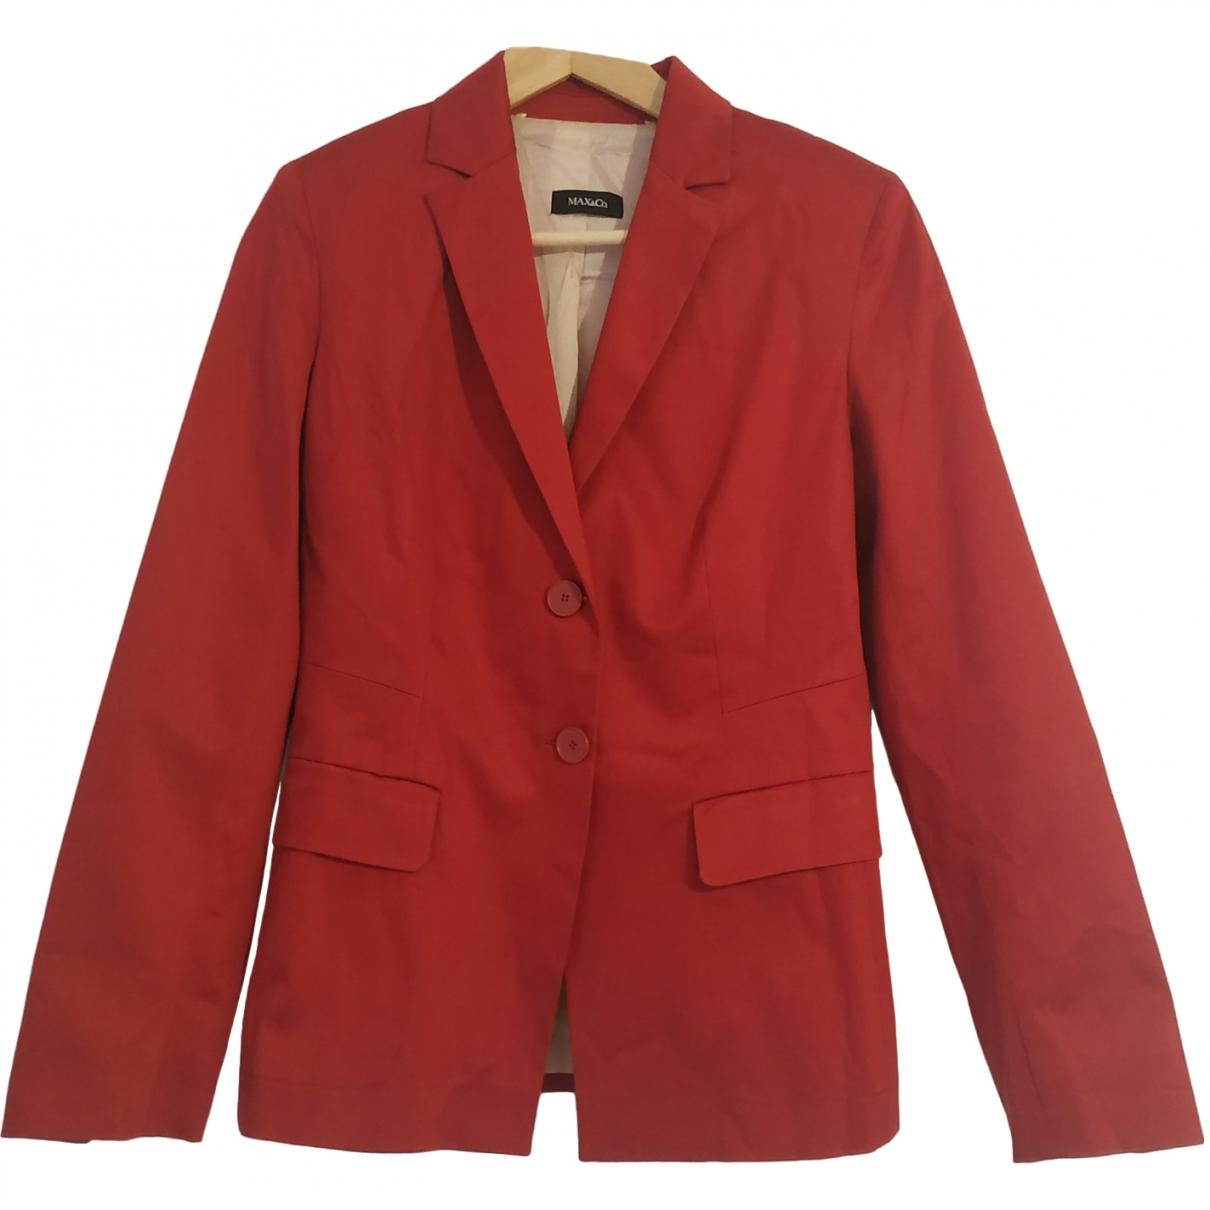 Max & Co \N Burgundy Cotton jacket for Women 10 UK